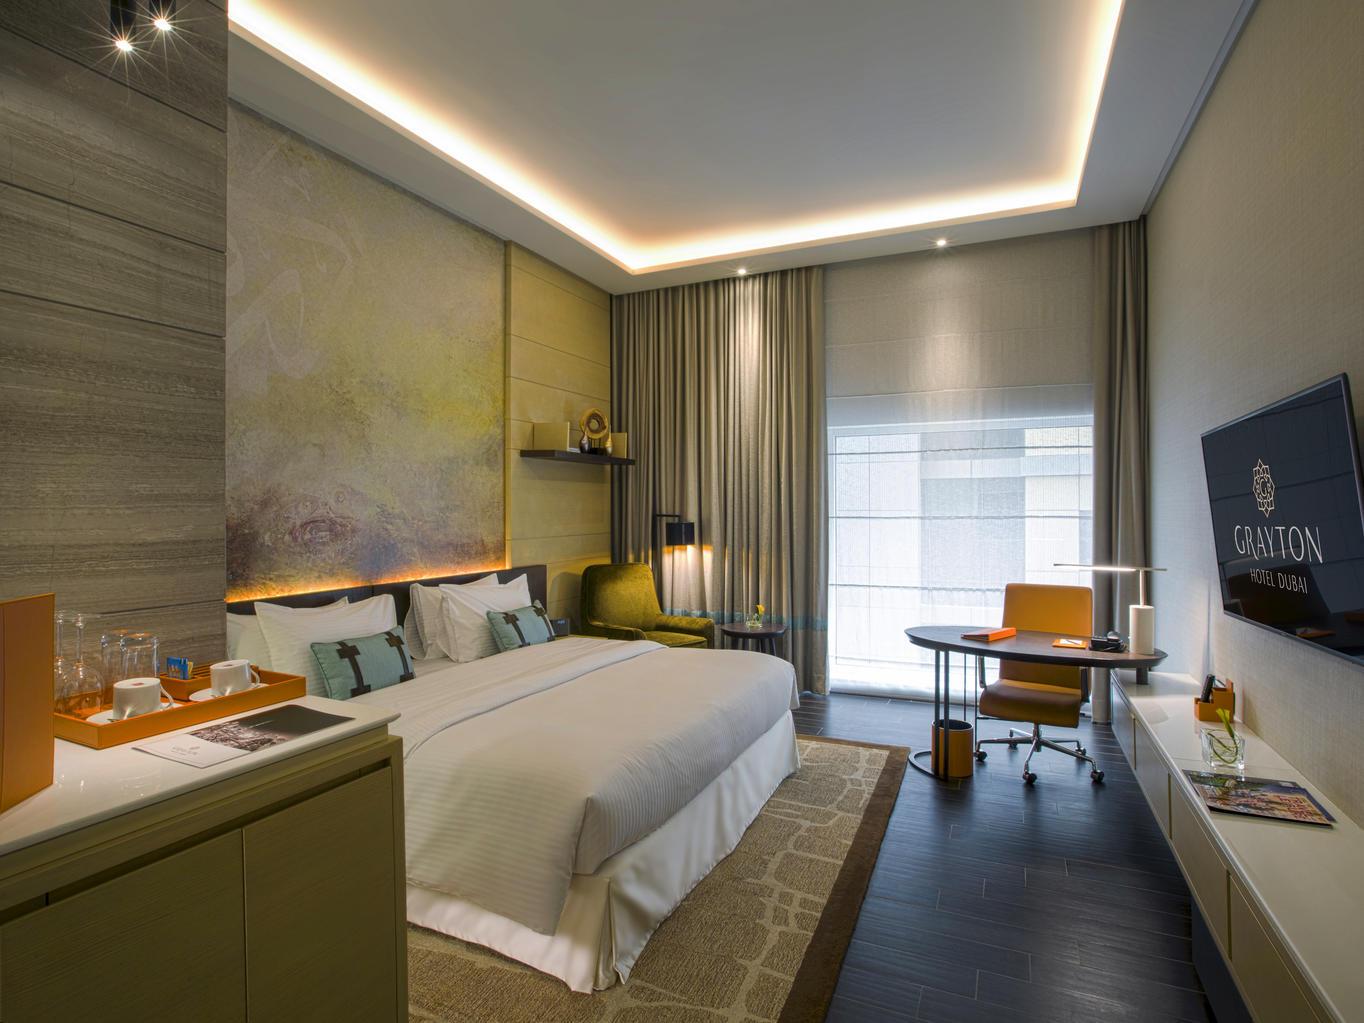 Classic Room at Grayton Hotel Dubai